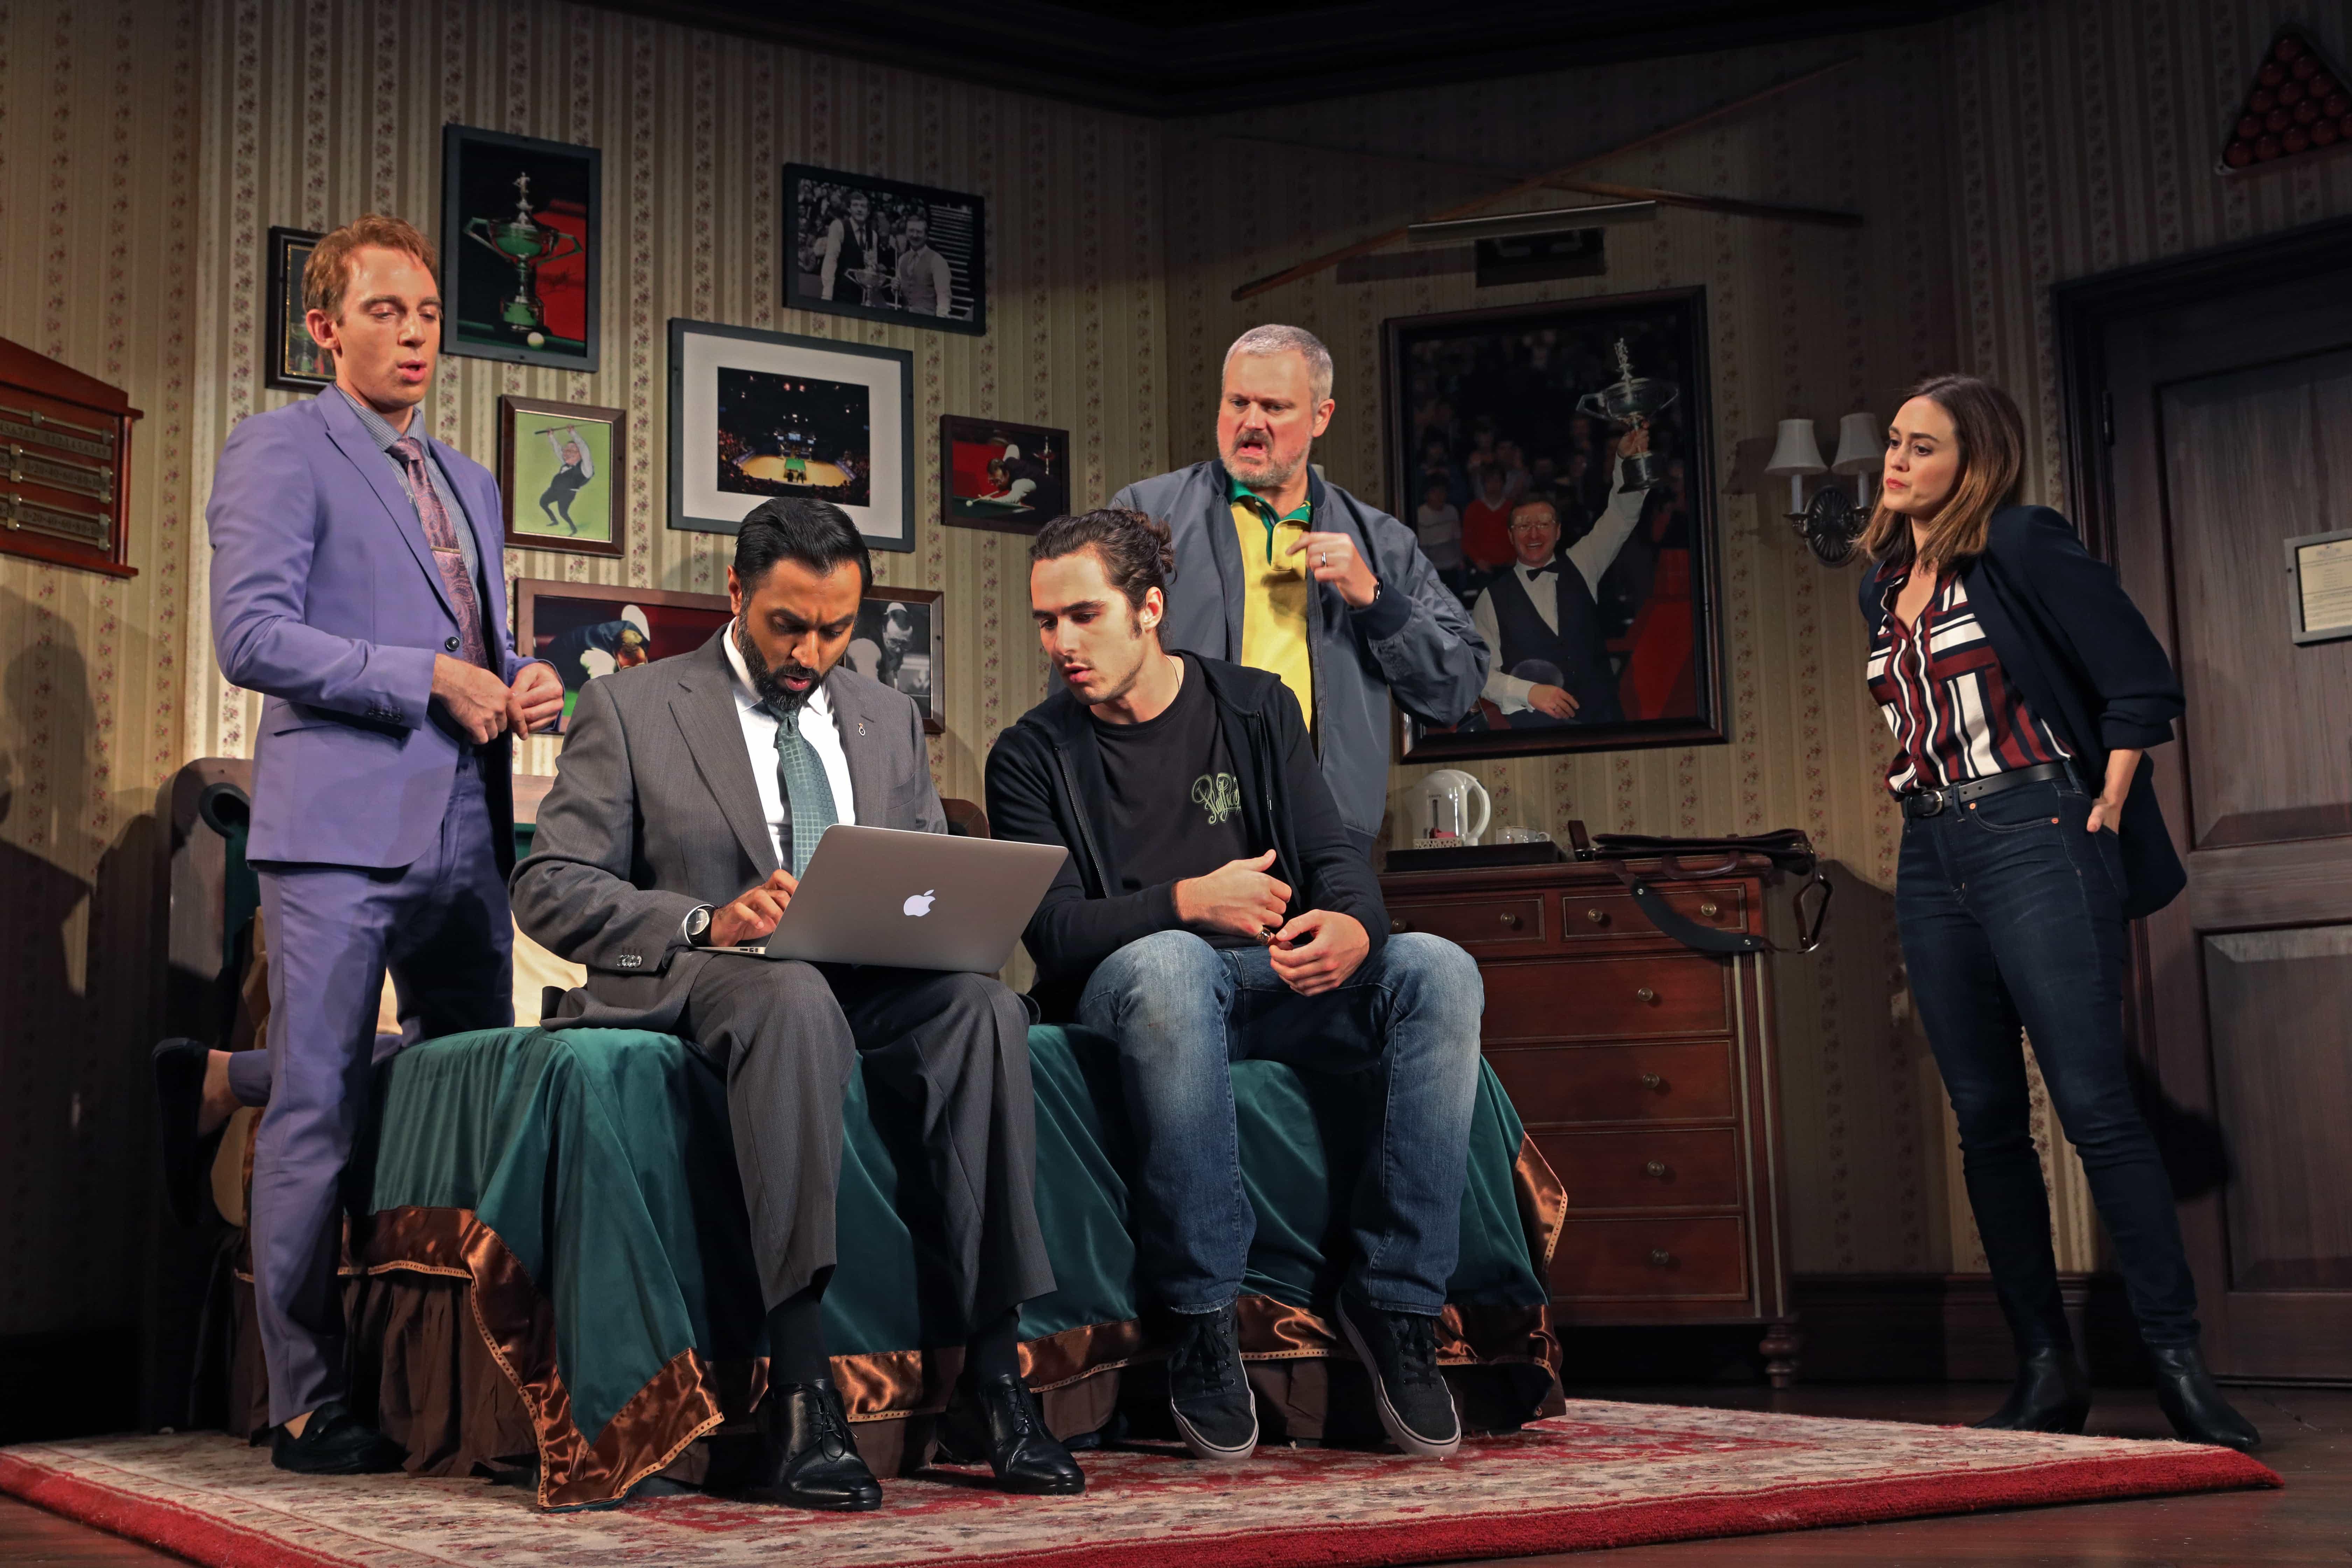 Max Gordon Moore, Bhavesh Patel, Ben Schnetzer, John Ellison Conlee, and Heather Lind. Photo by Joan Marcus.